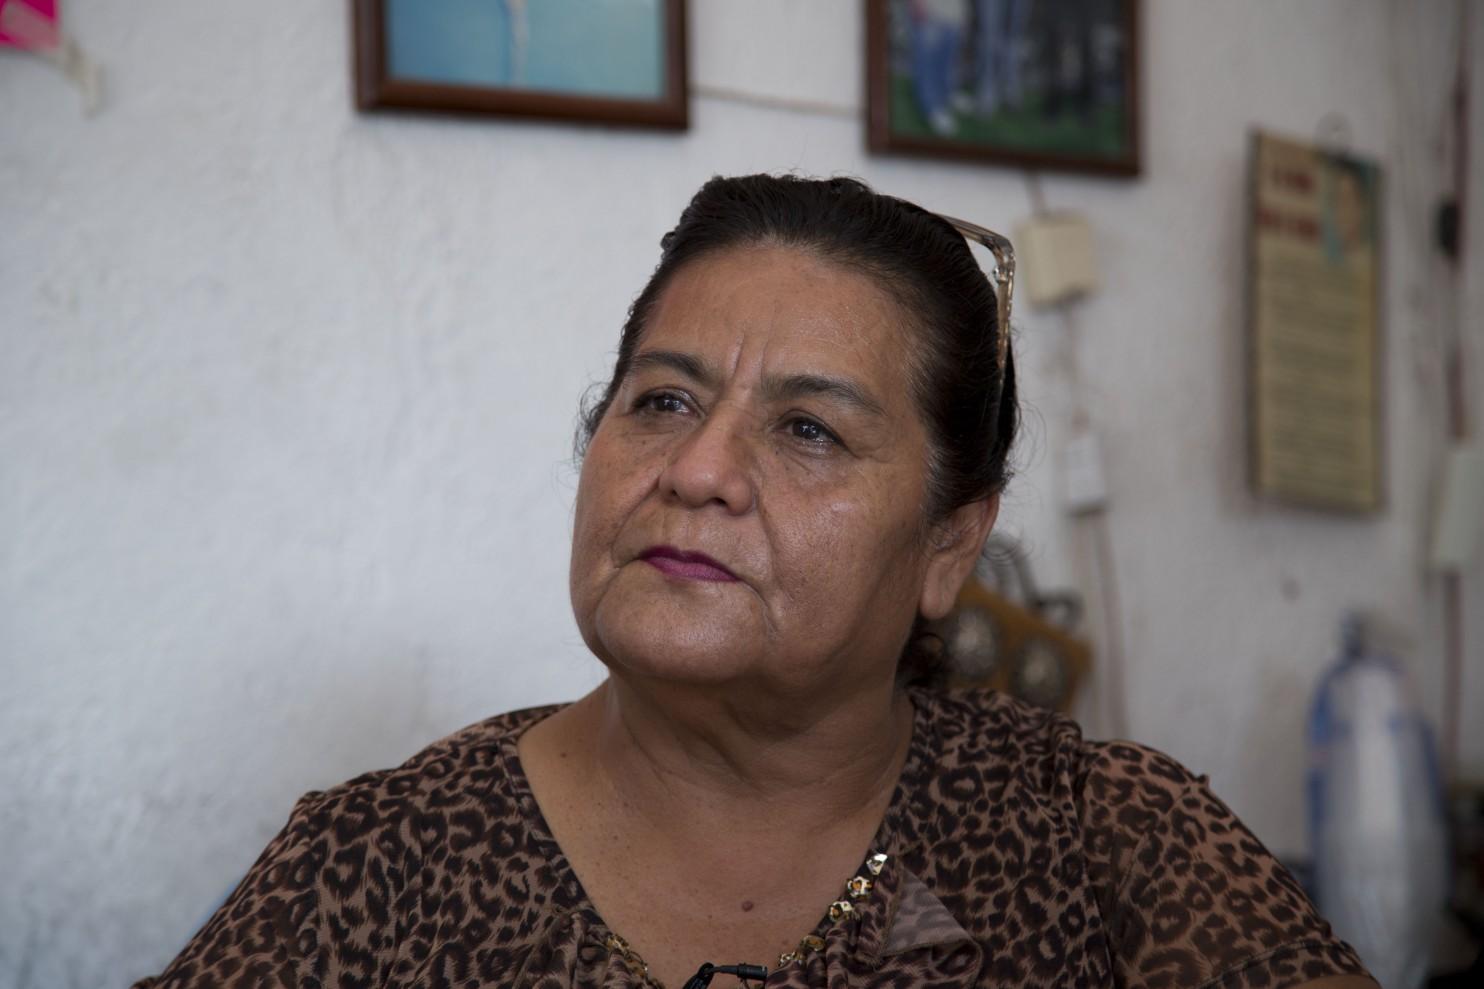 Maria Guadalupe Orozco